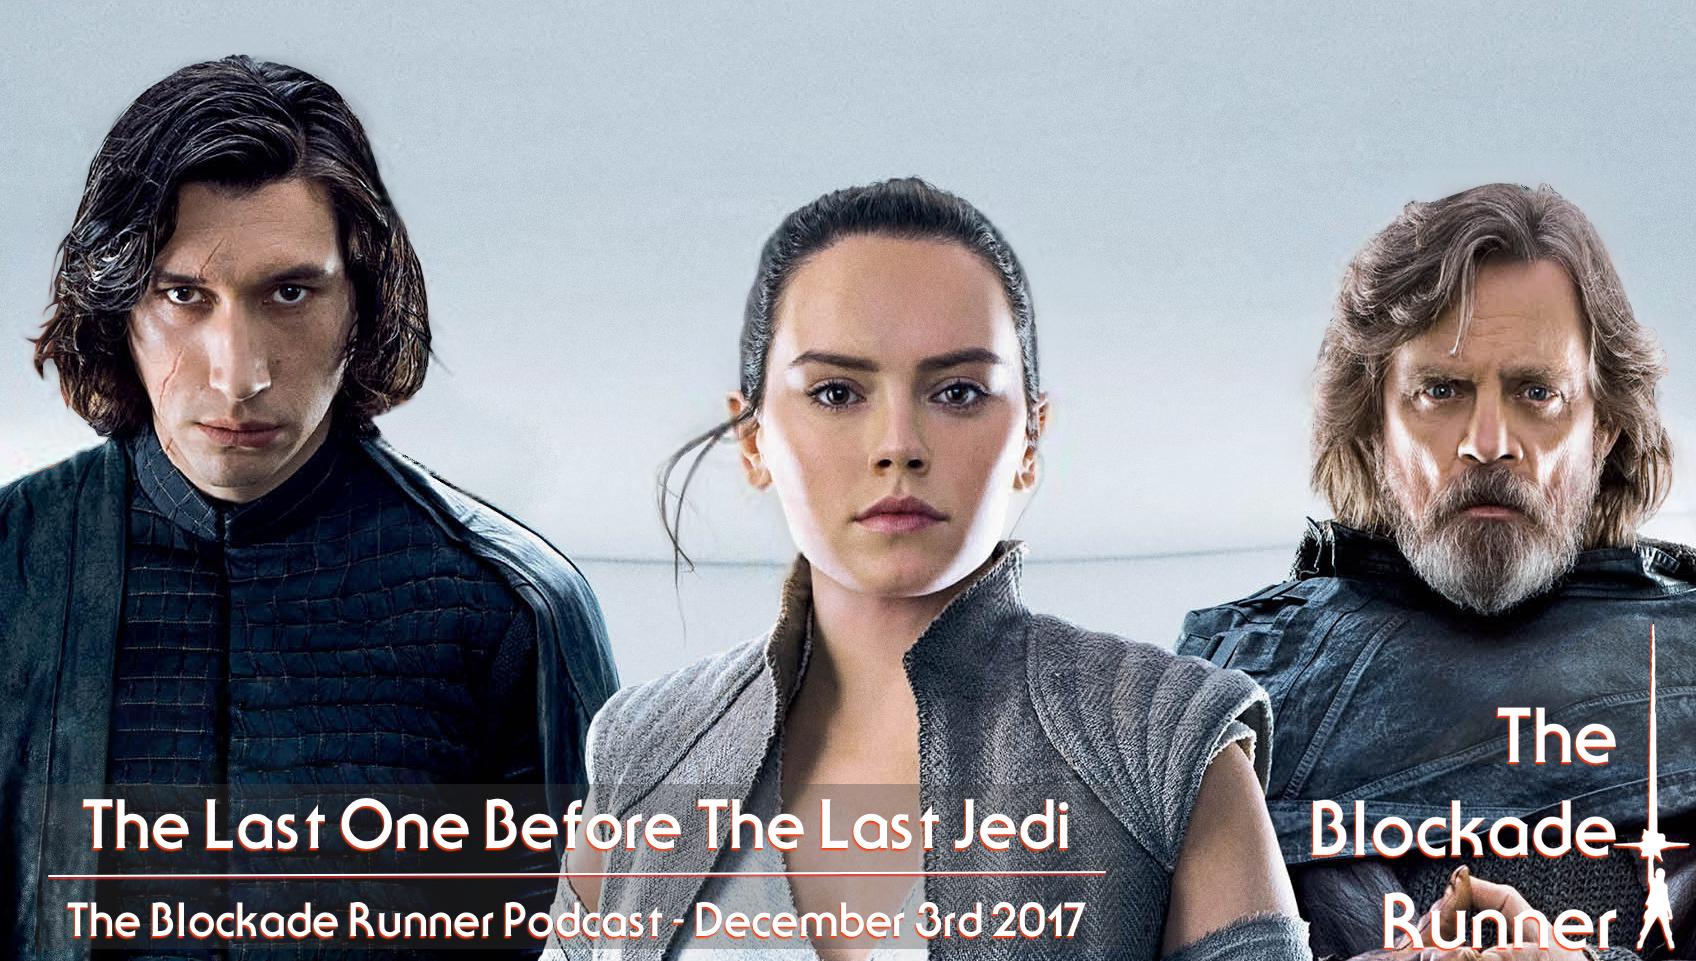 Last One Before Last Jedi Cover